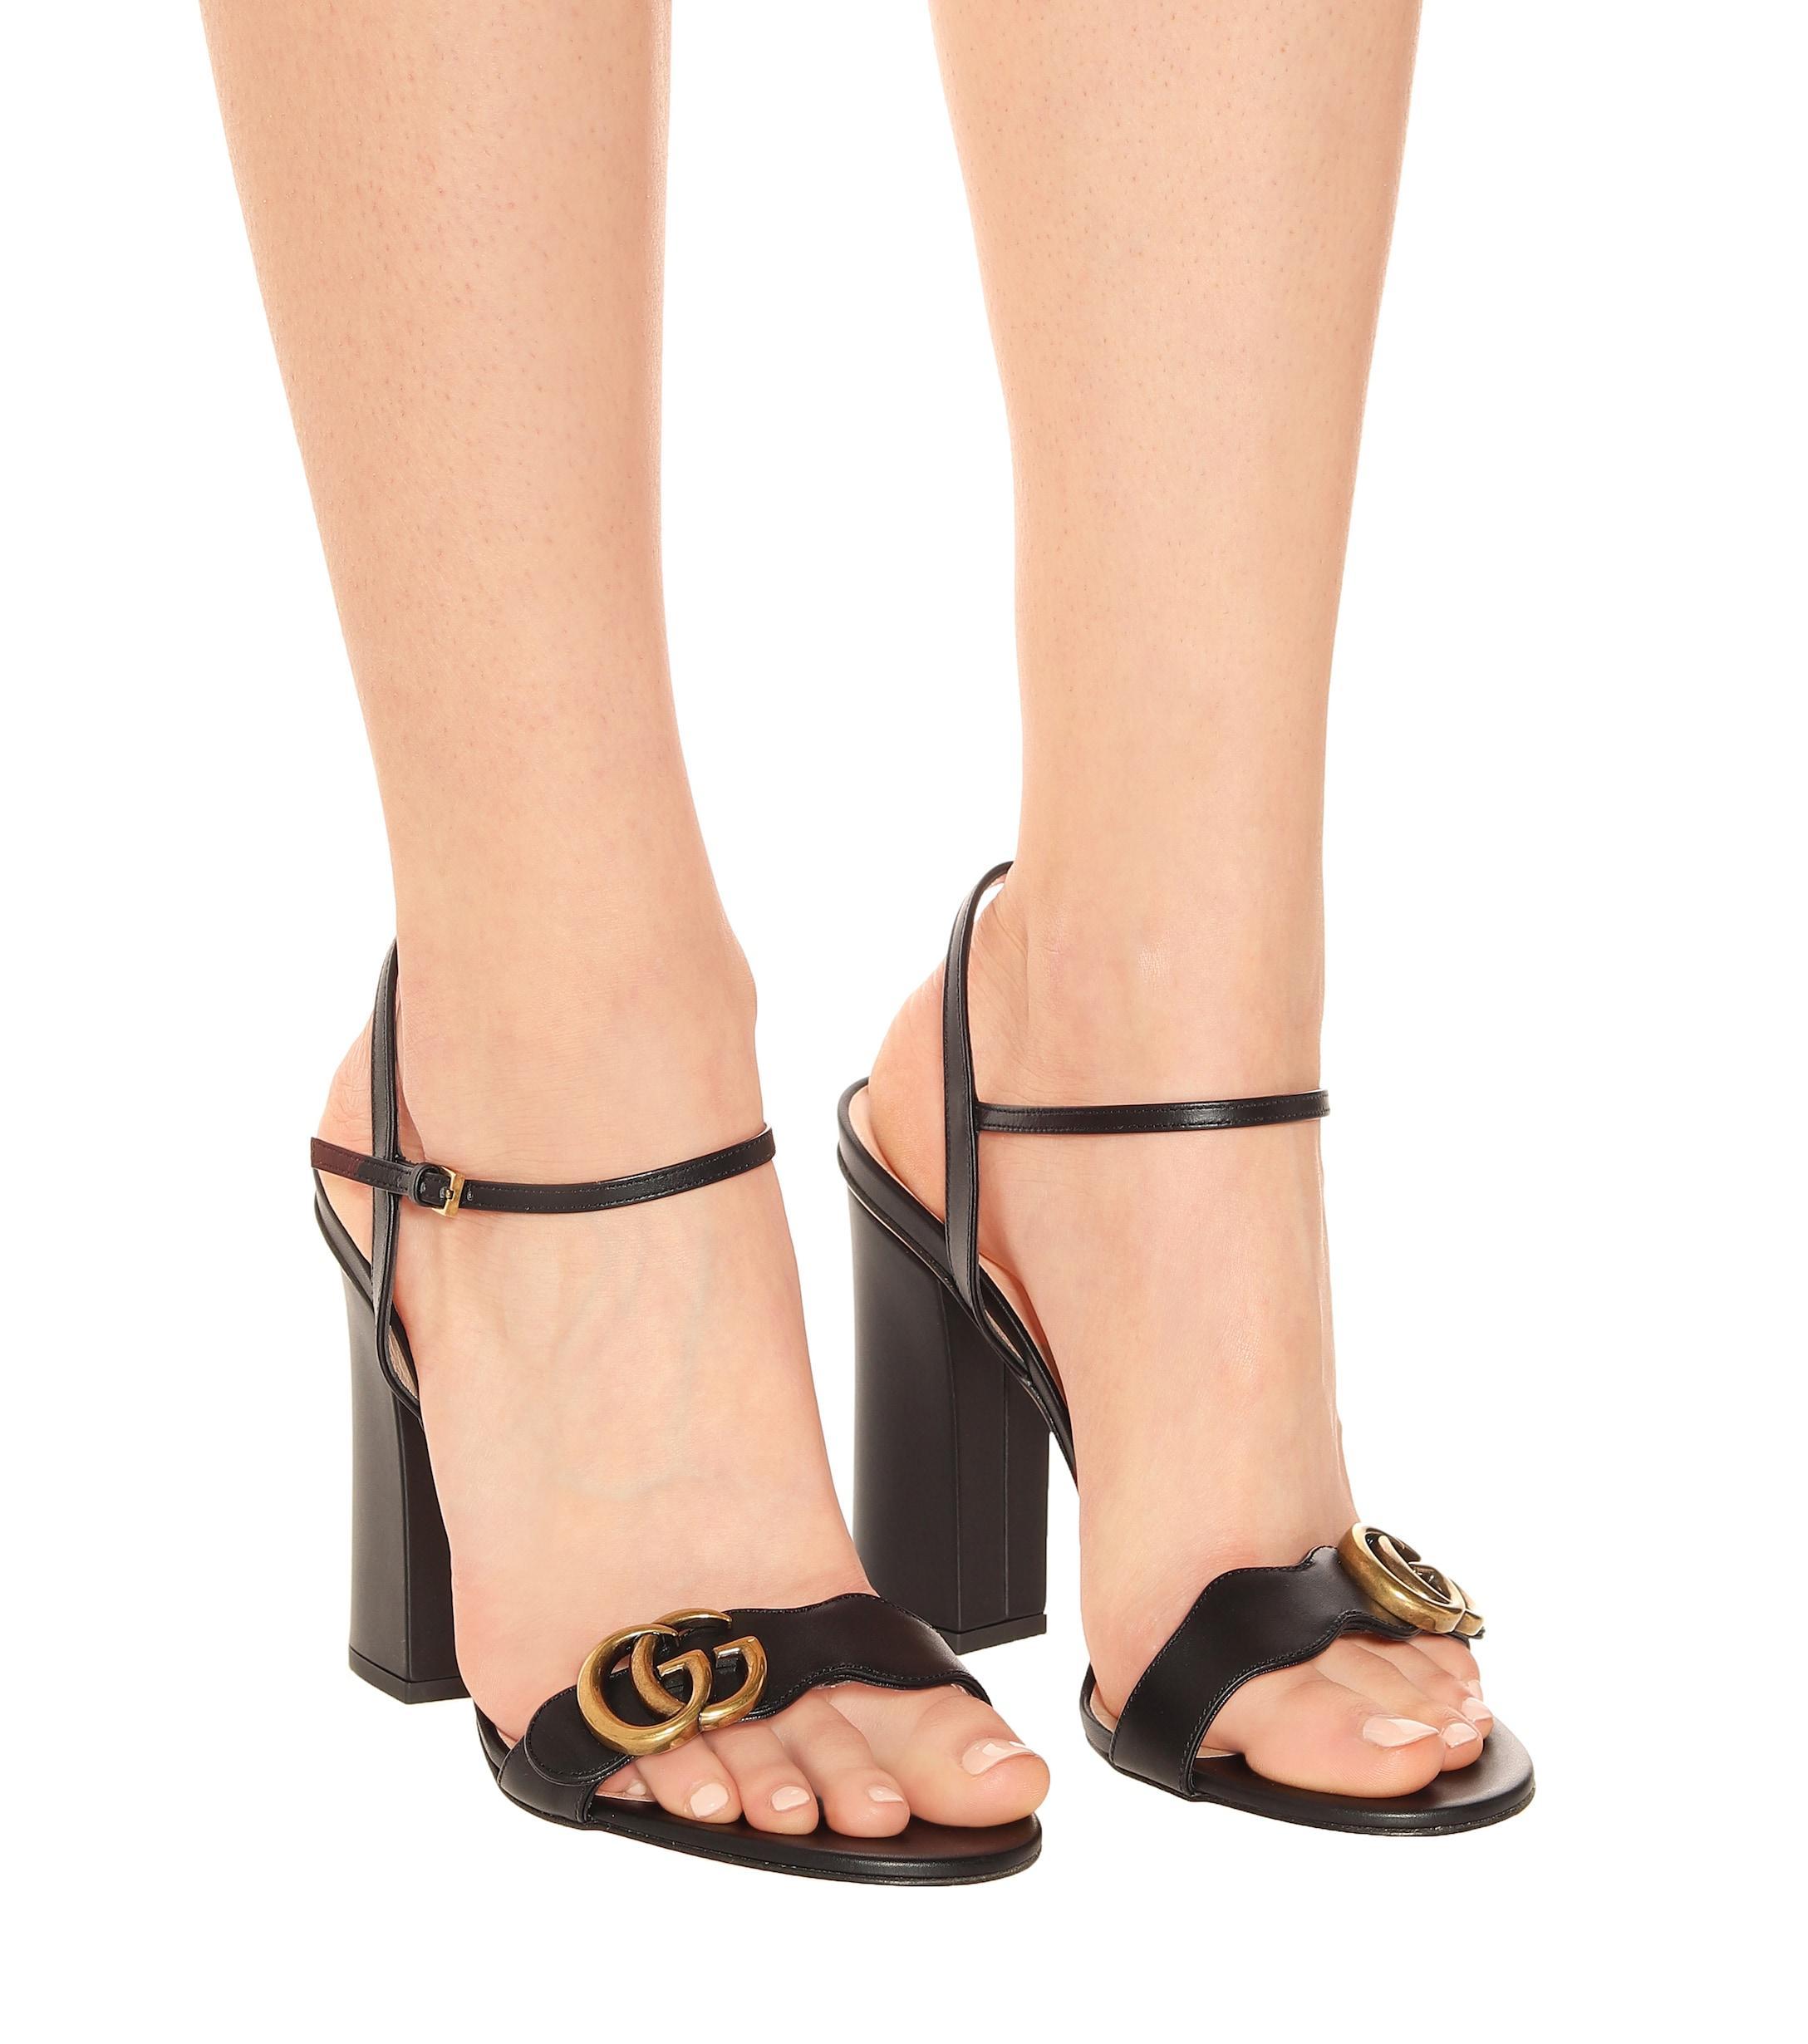 Gucci GG Marmont Block-heel Sandals in